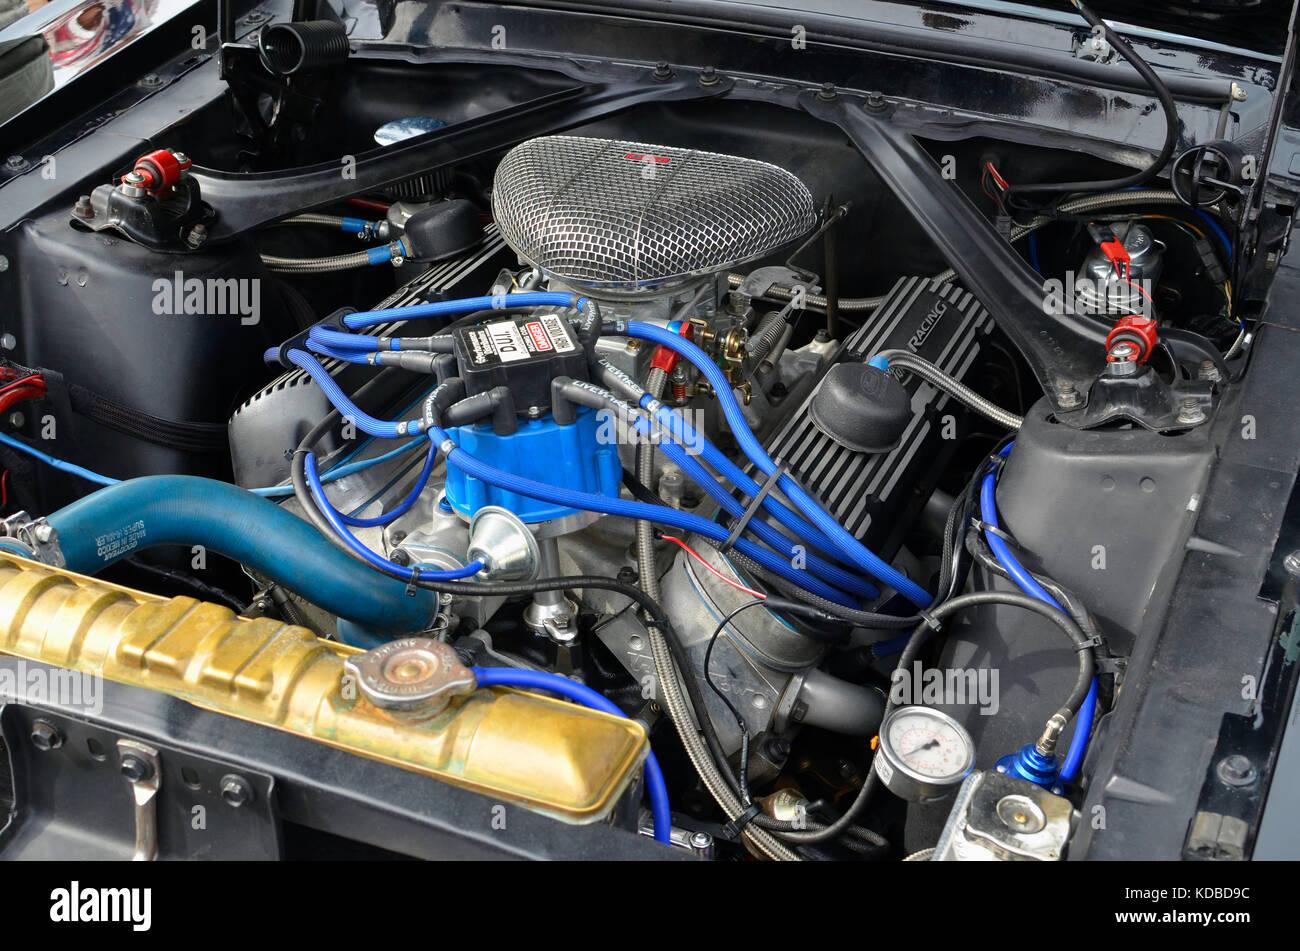 Powerful v8 engine stock photos powerful v8 engine stock - Spa torrejon de ardoz ...